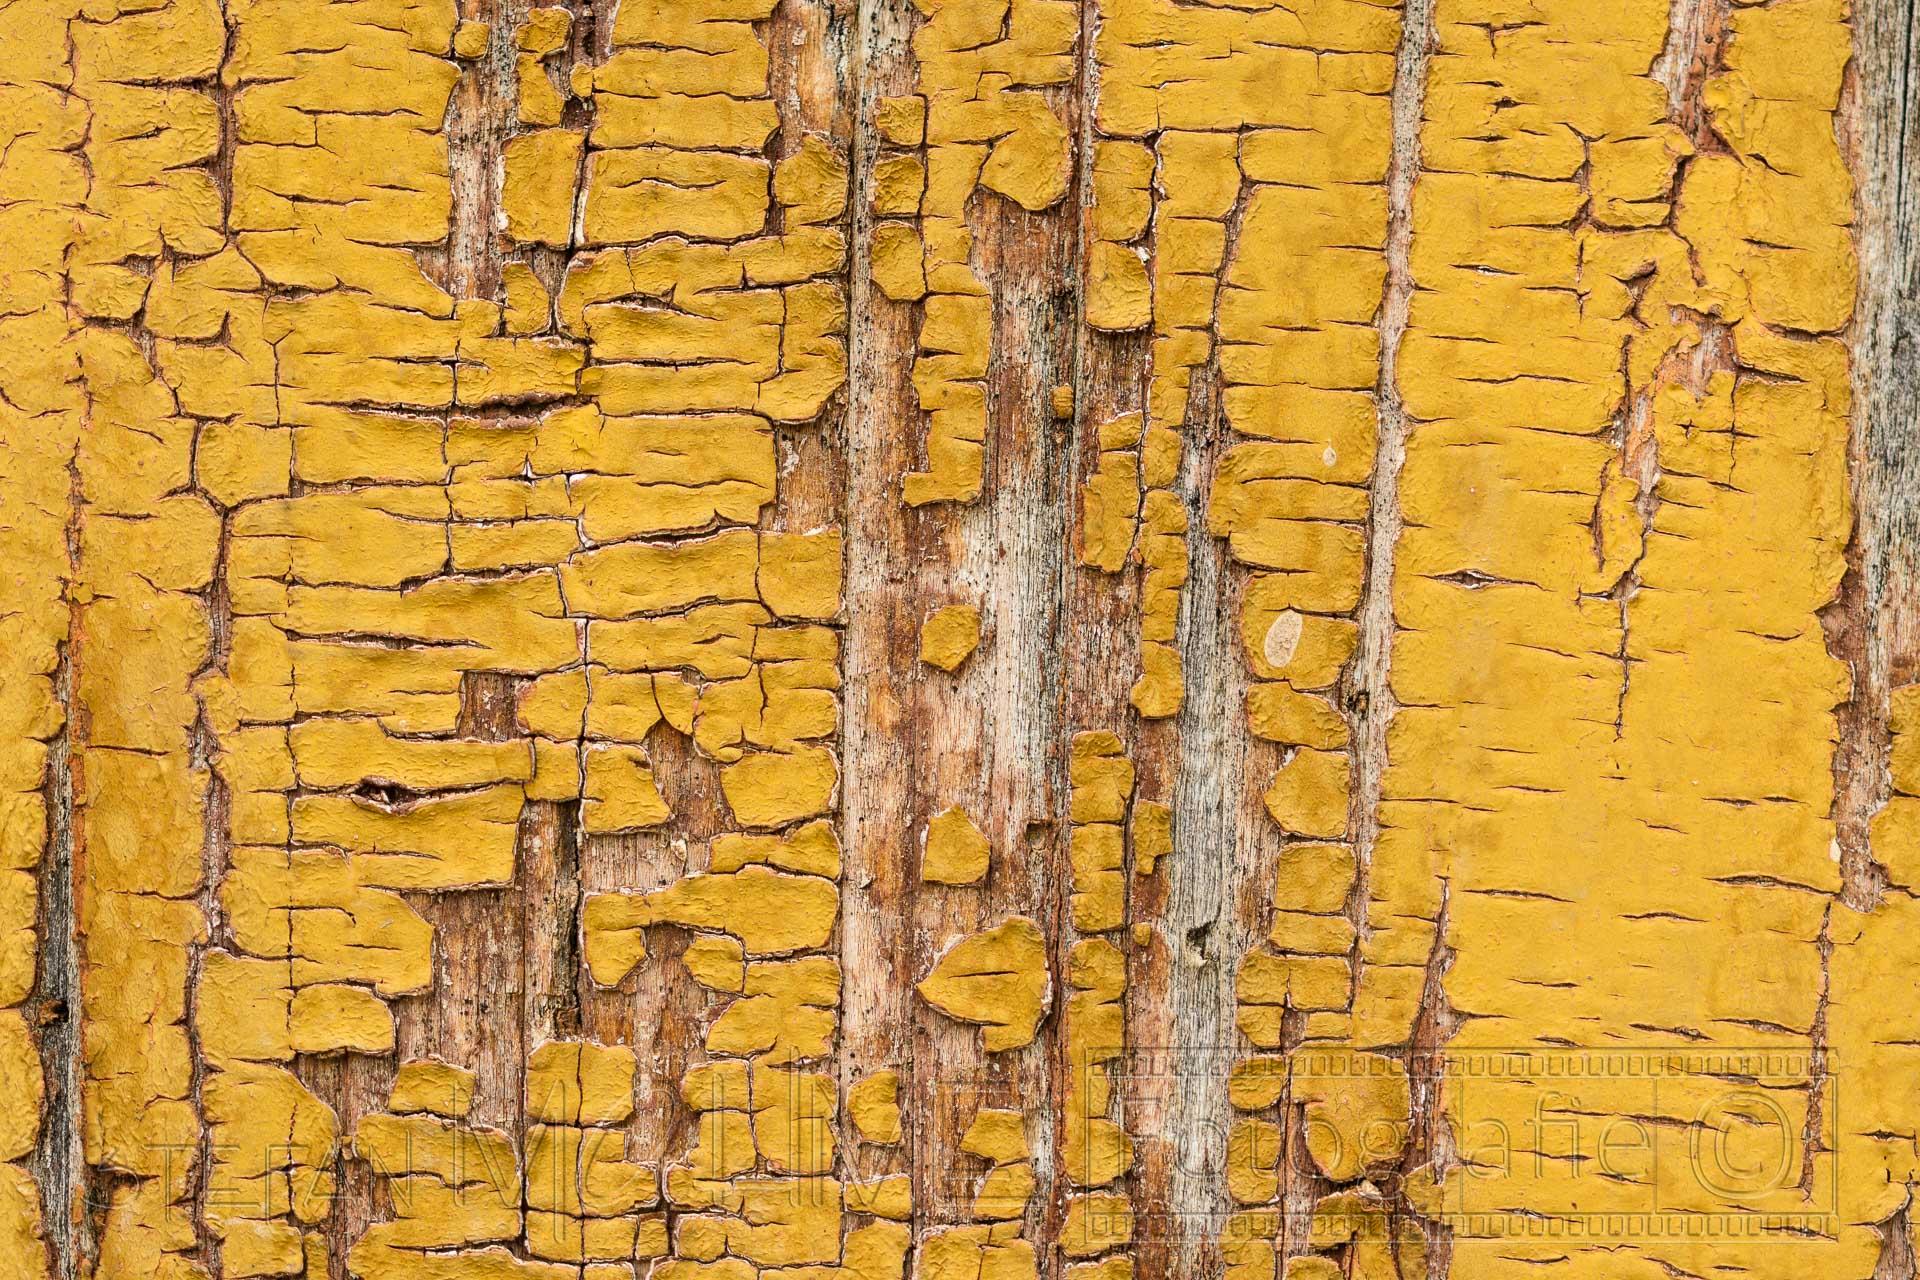 gelb,farbe,alt,oberflaeche,struktur,muster,details,textur,holz